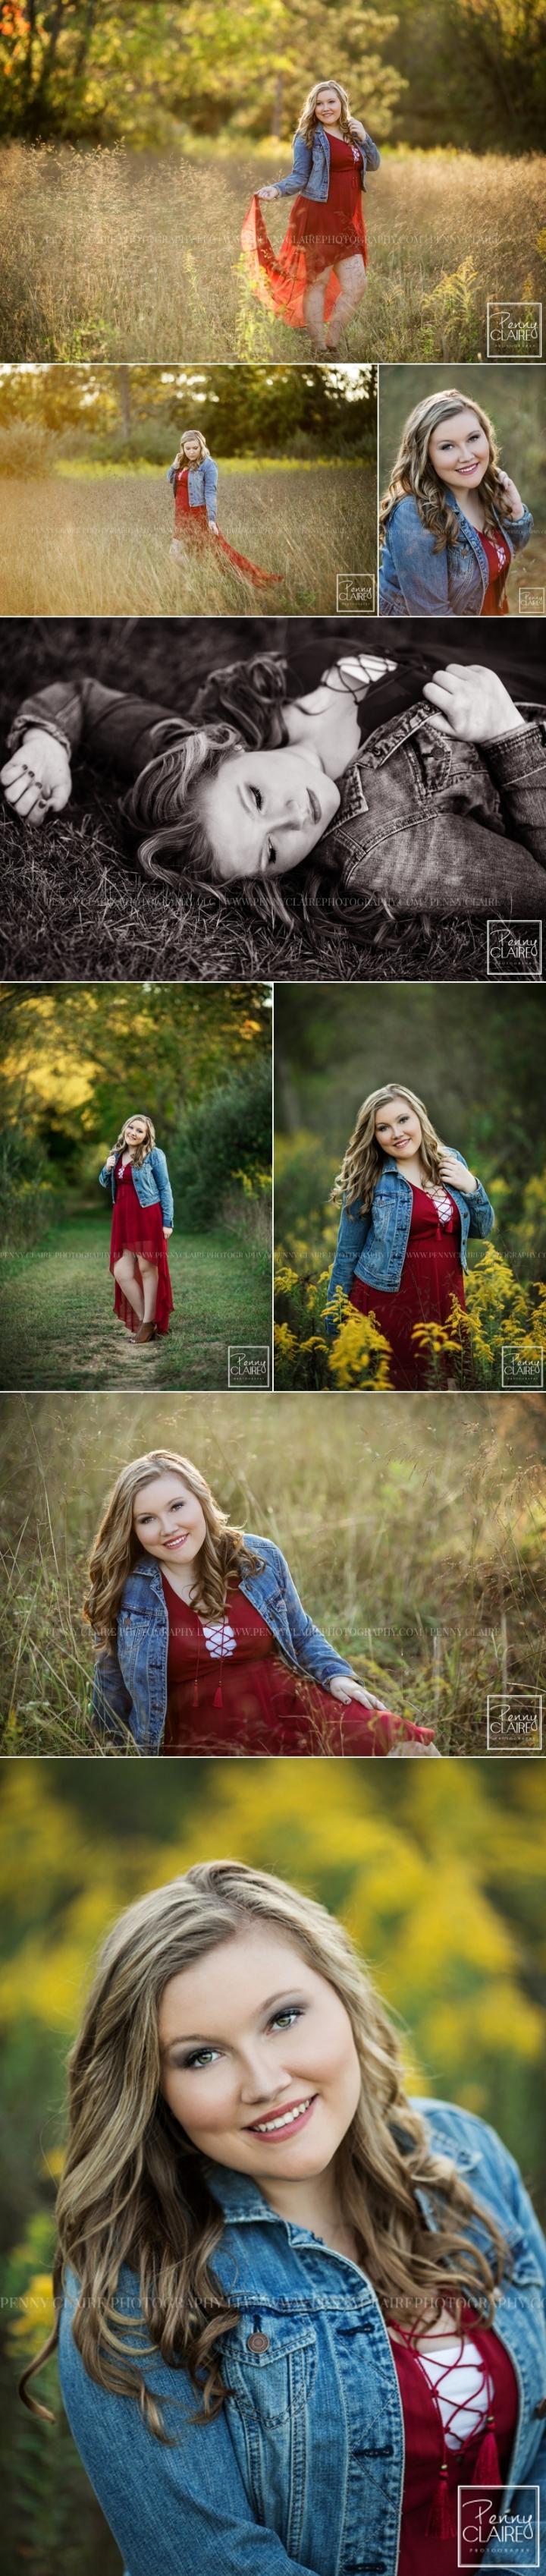 high-school-senior-photos-pennyclaire-8